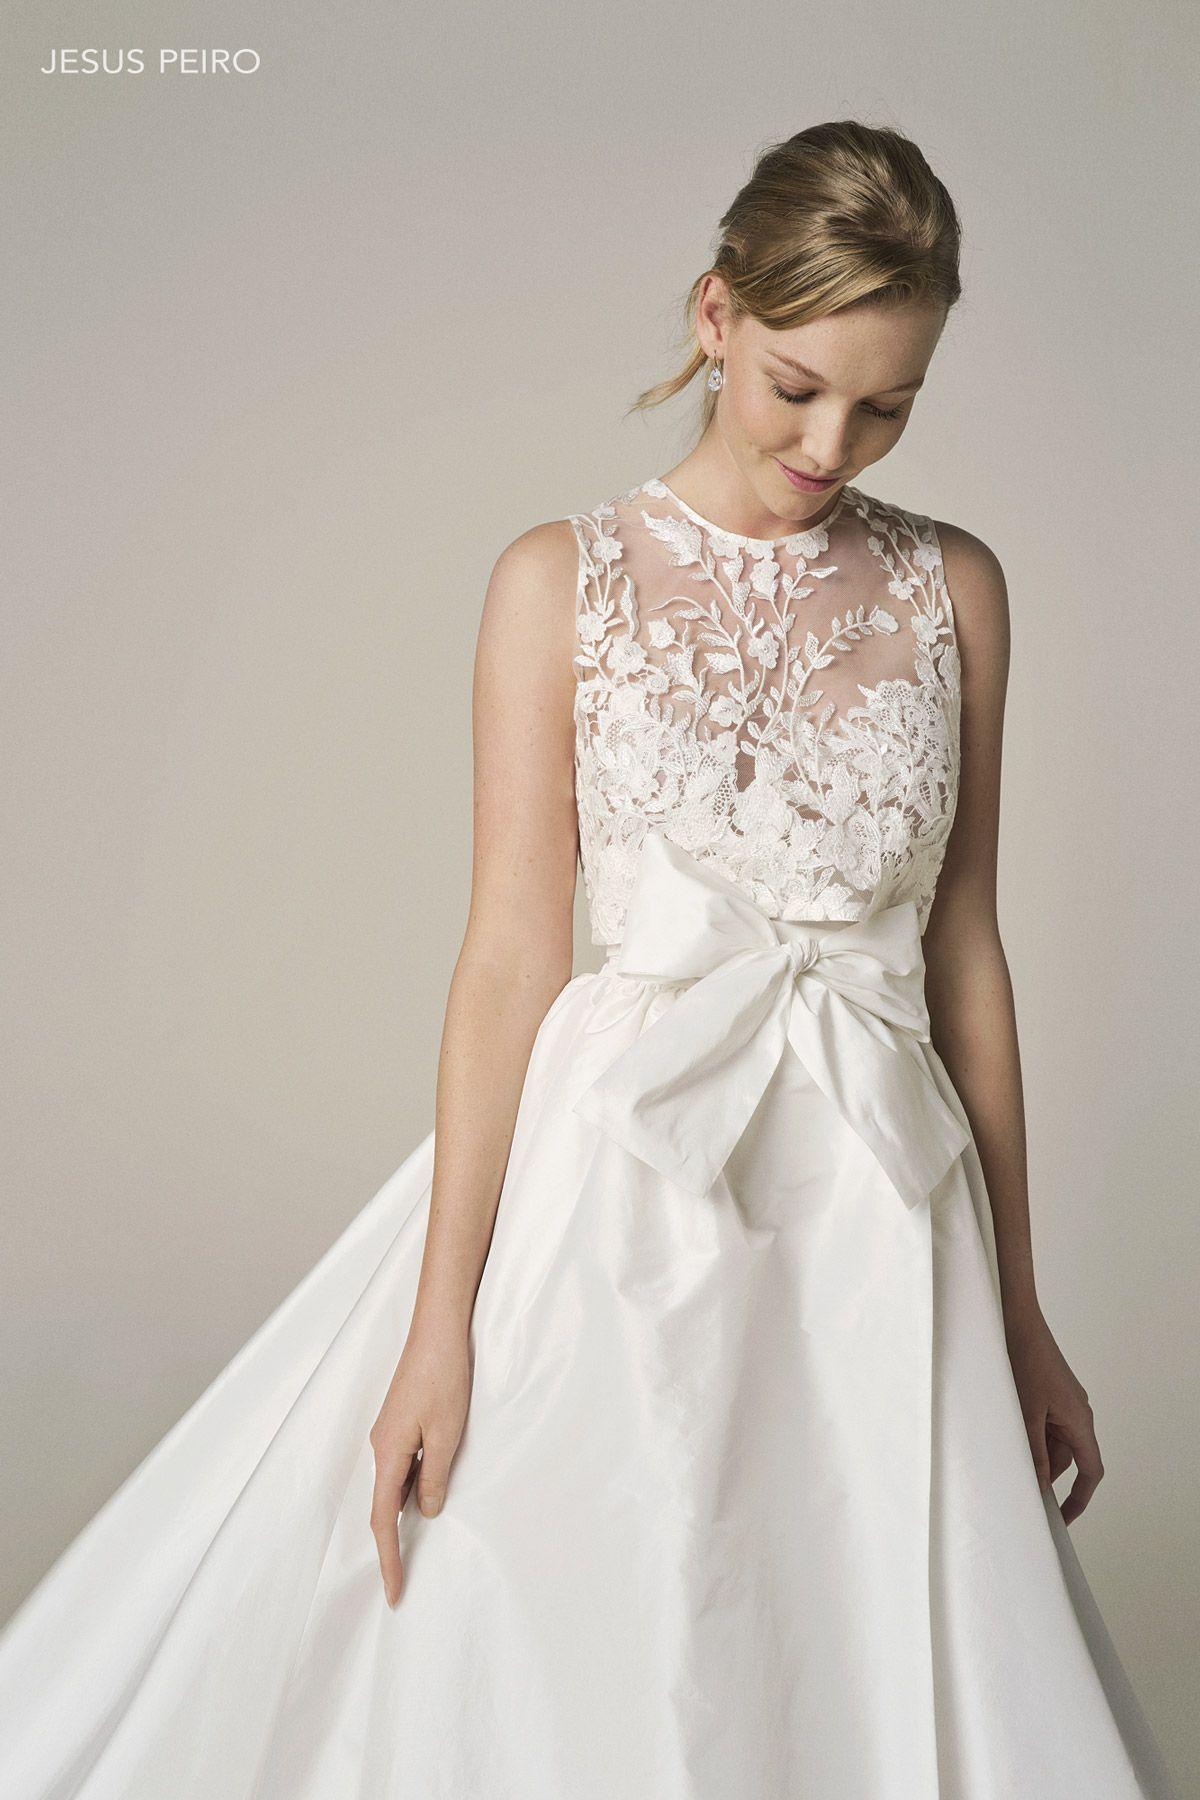 Jesus Peiro Amalia Collection 2021 In 2020 Wedding Dresses Wedding Dress Styles Designer Wedding Dresses